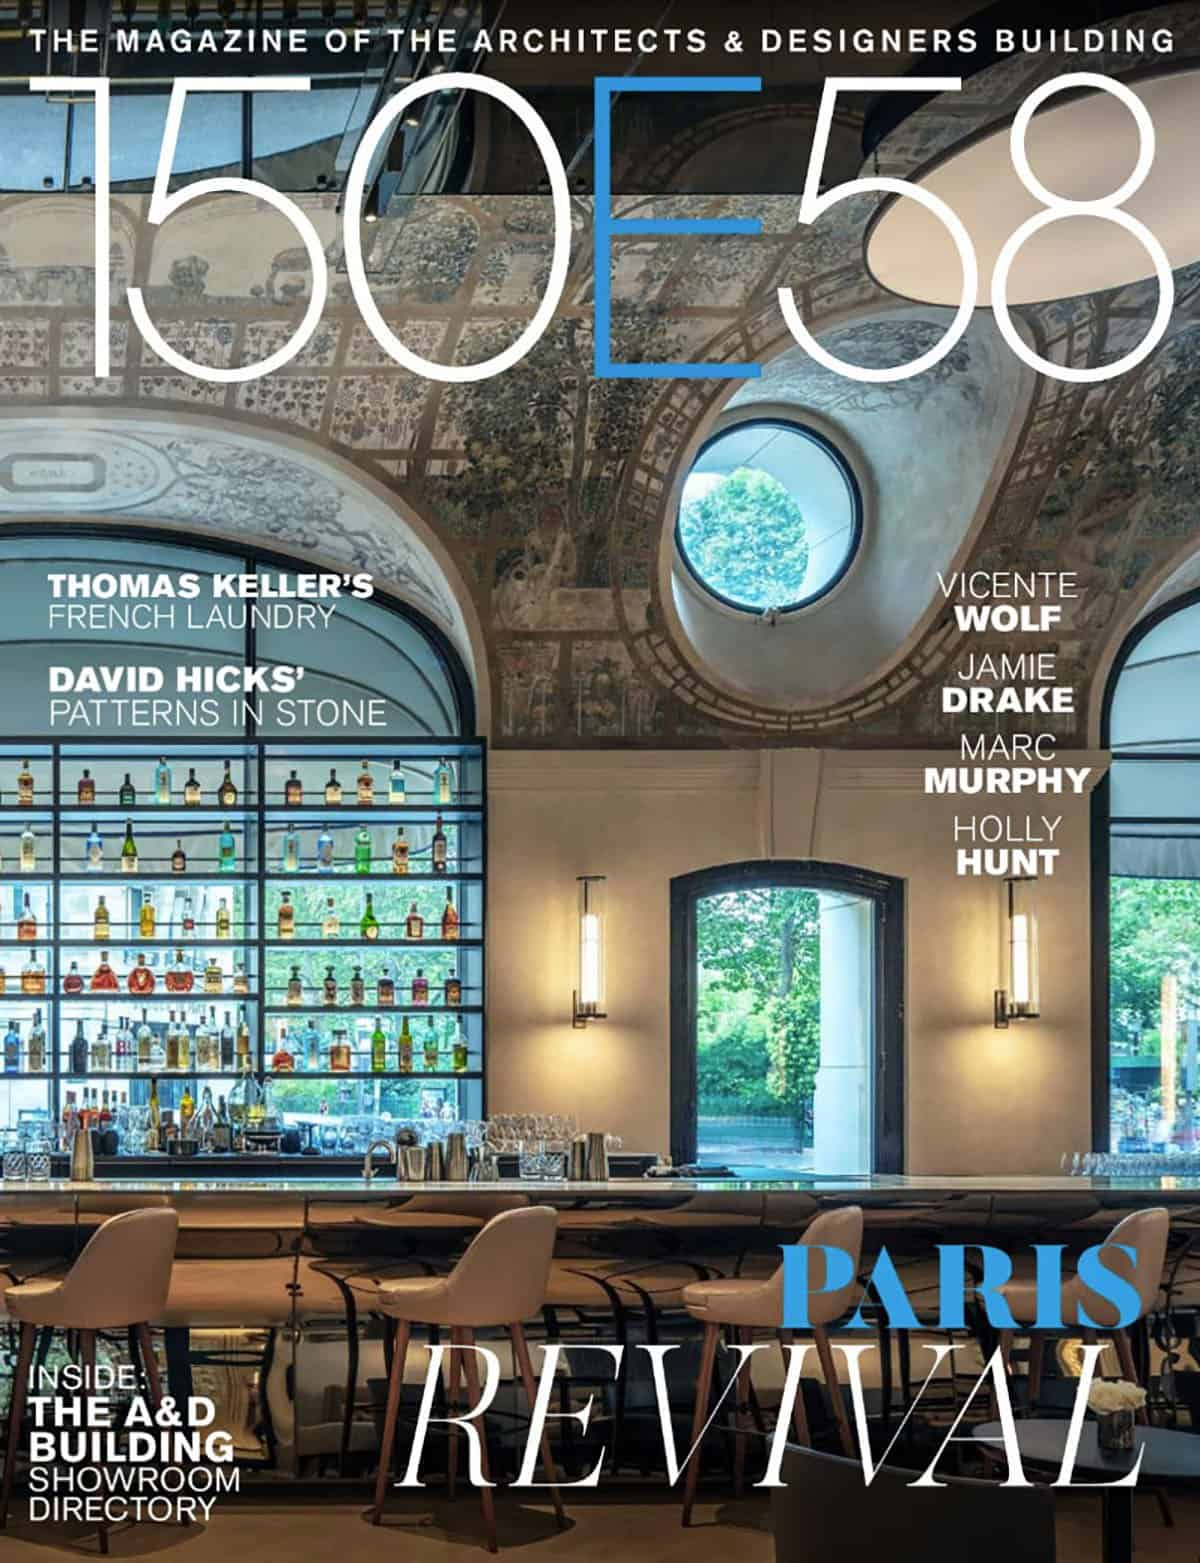 eggersmann featured in 150E58 magazine